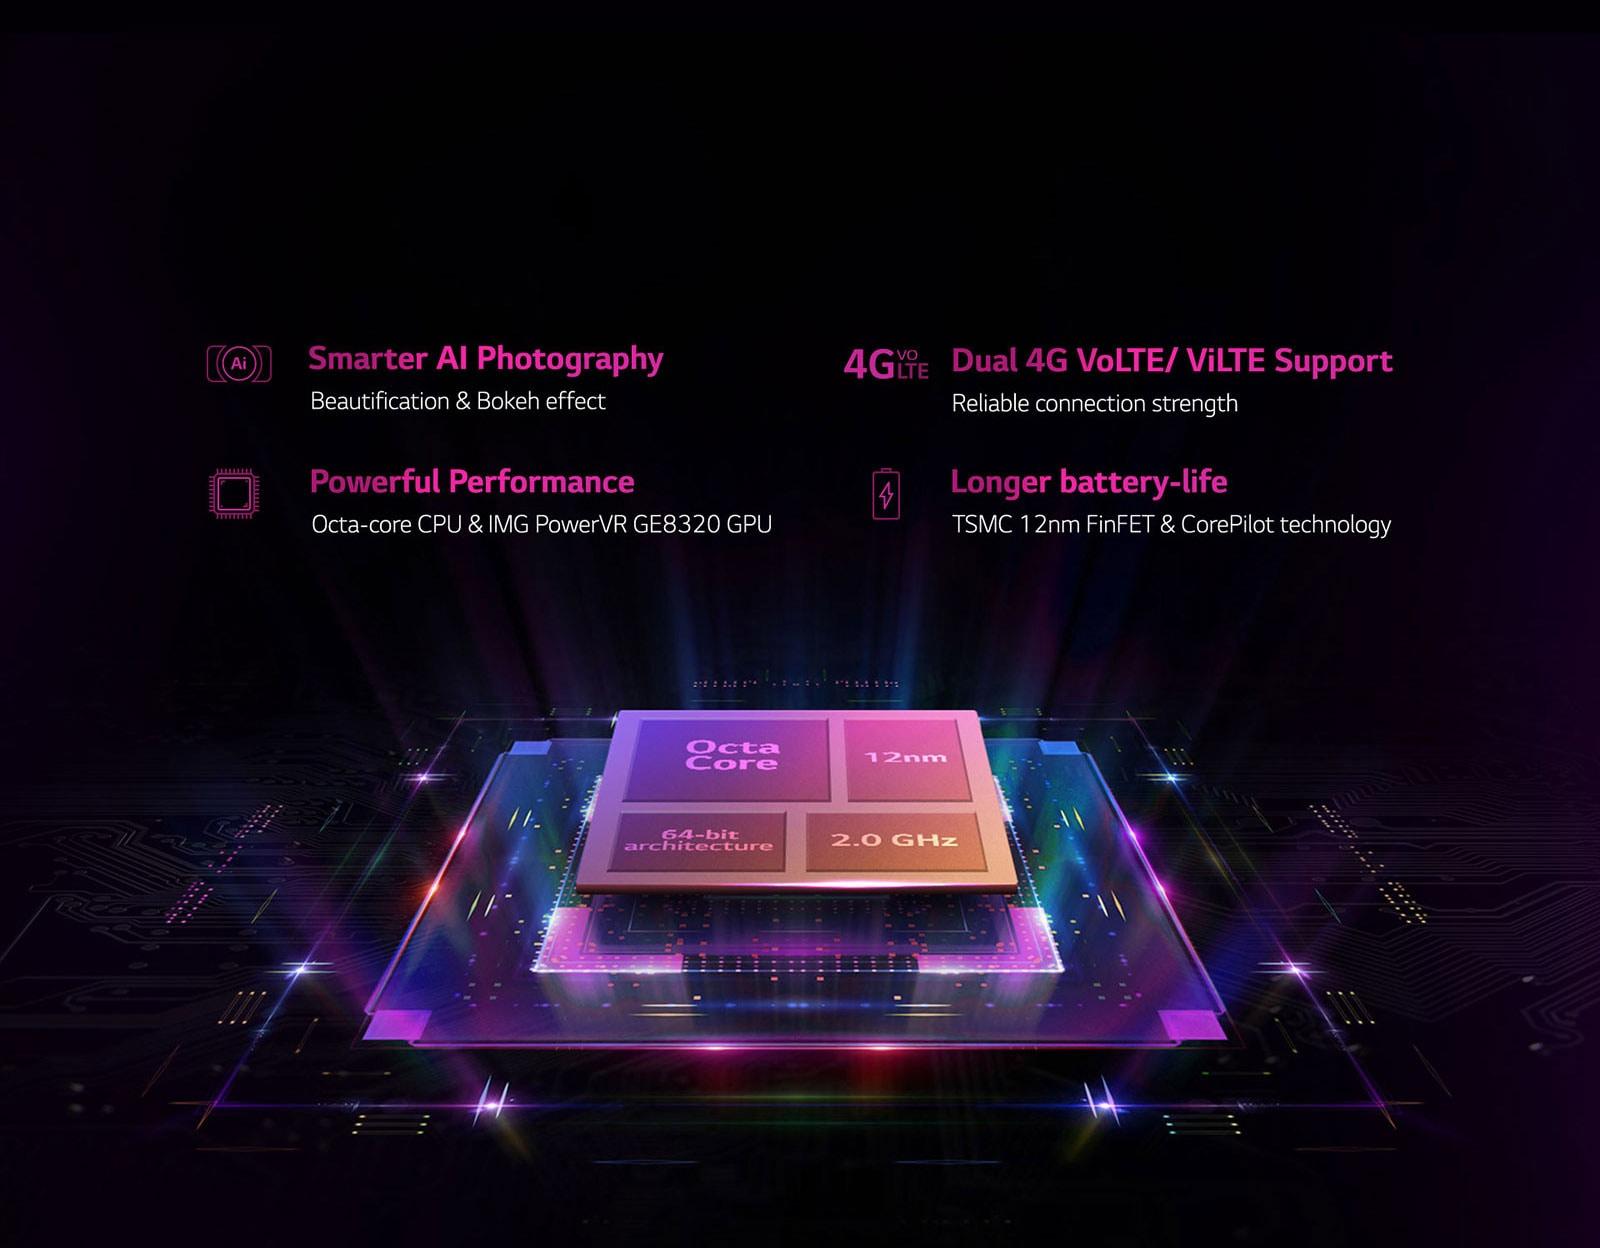 LG W10 (LMX130IM) - Smartphone With Dual AI Camera | LG India